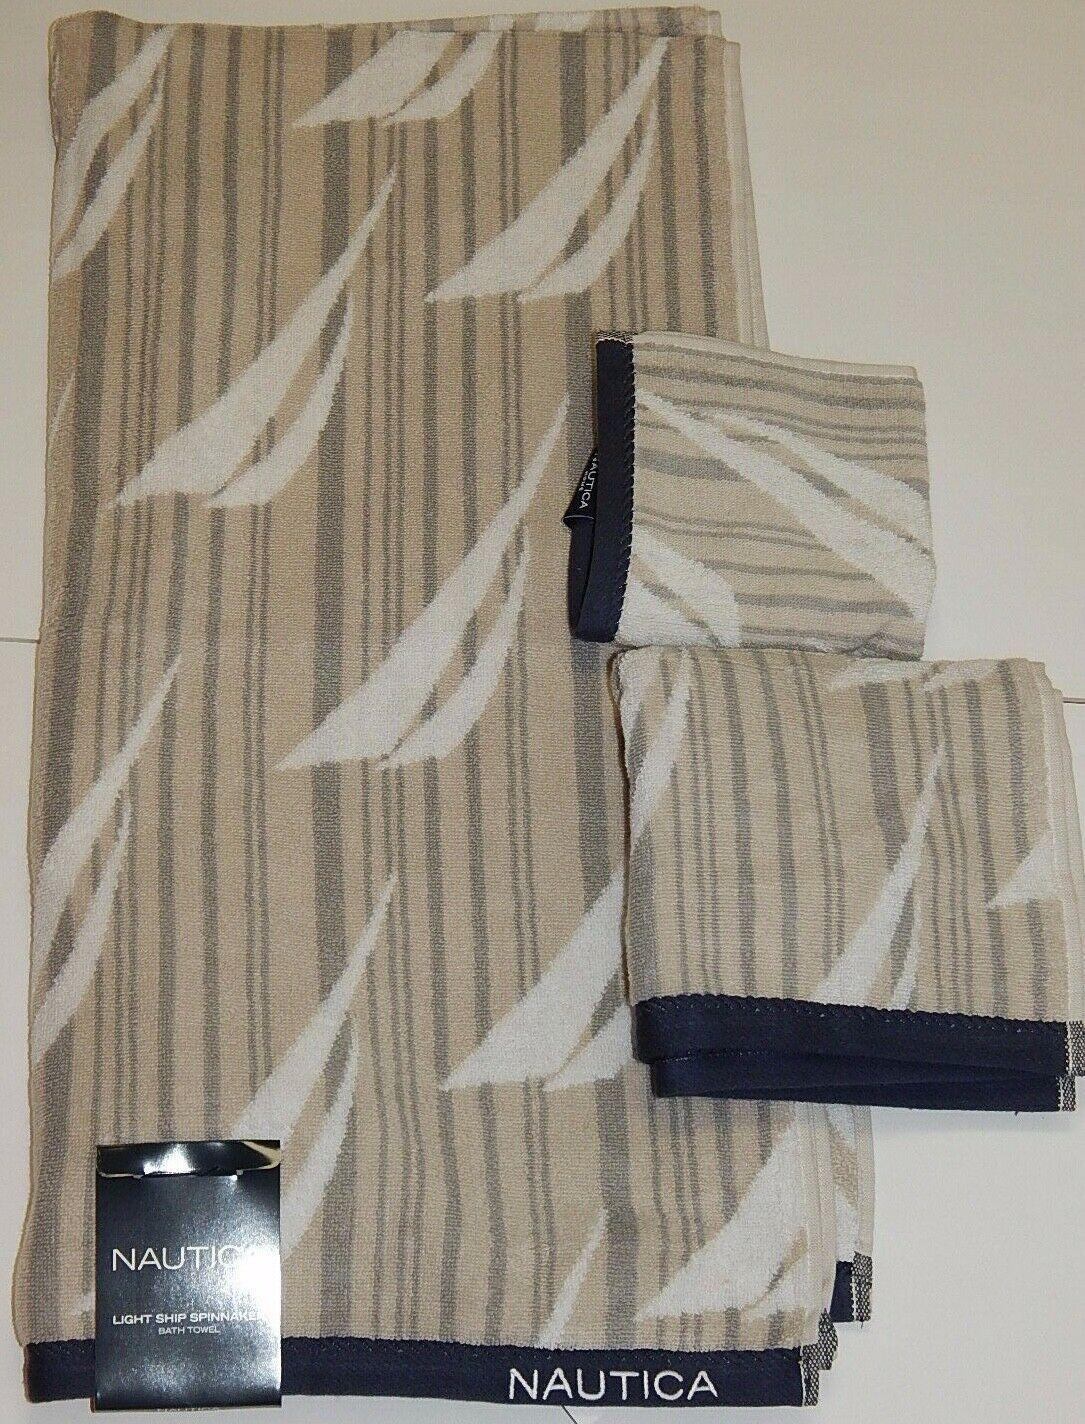 Details About Nautica 100 Cotton Light Ship Spinnaker 3 Piece Bath Hand Wash Towels Set New In 2020 Best Bath Towels Bath Towels Luxury Cotton Lights